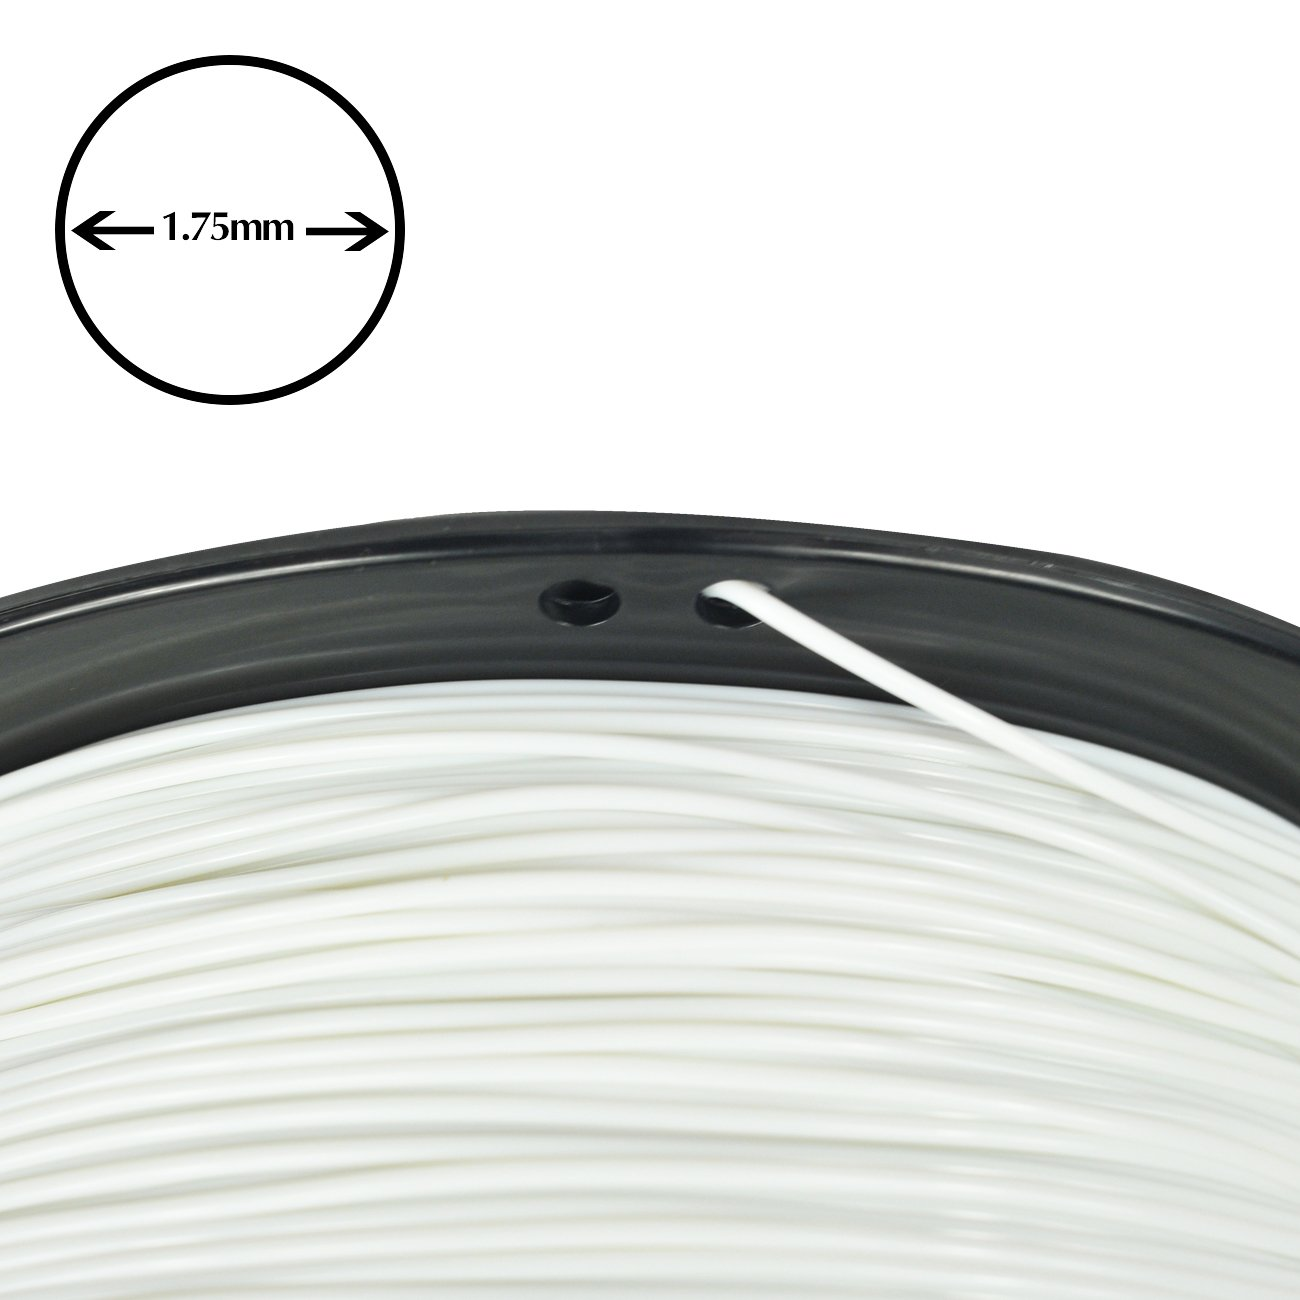 1kg Spool,White Dimensional Accuracy //-0.03 mm PRILINE PLA 1.75 3D Printer Filament